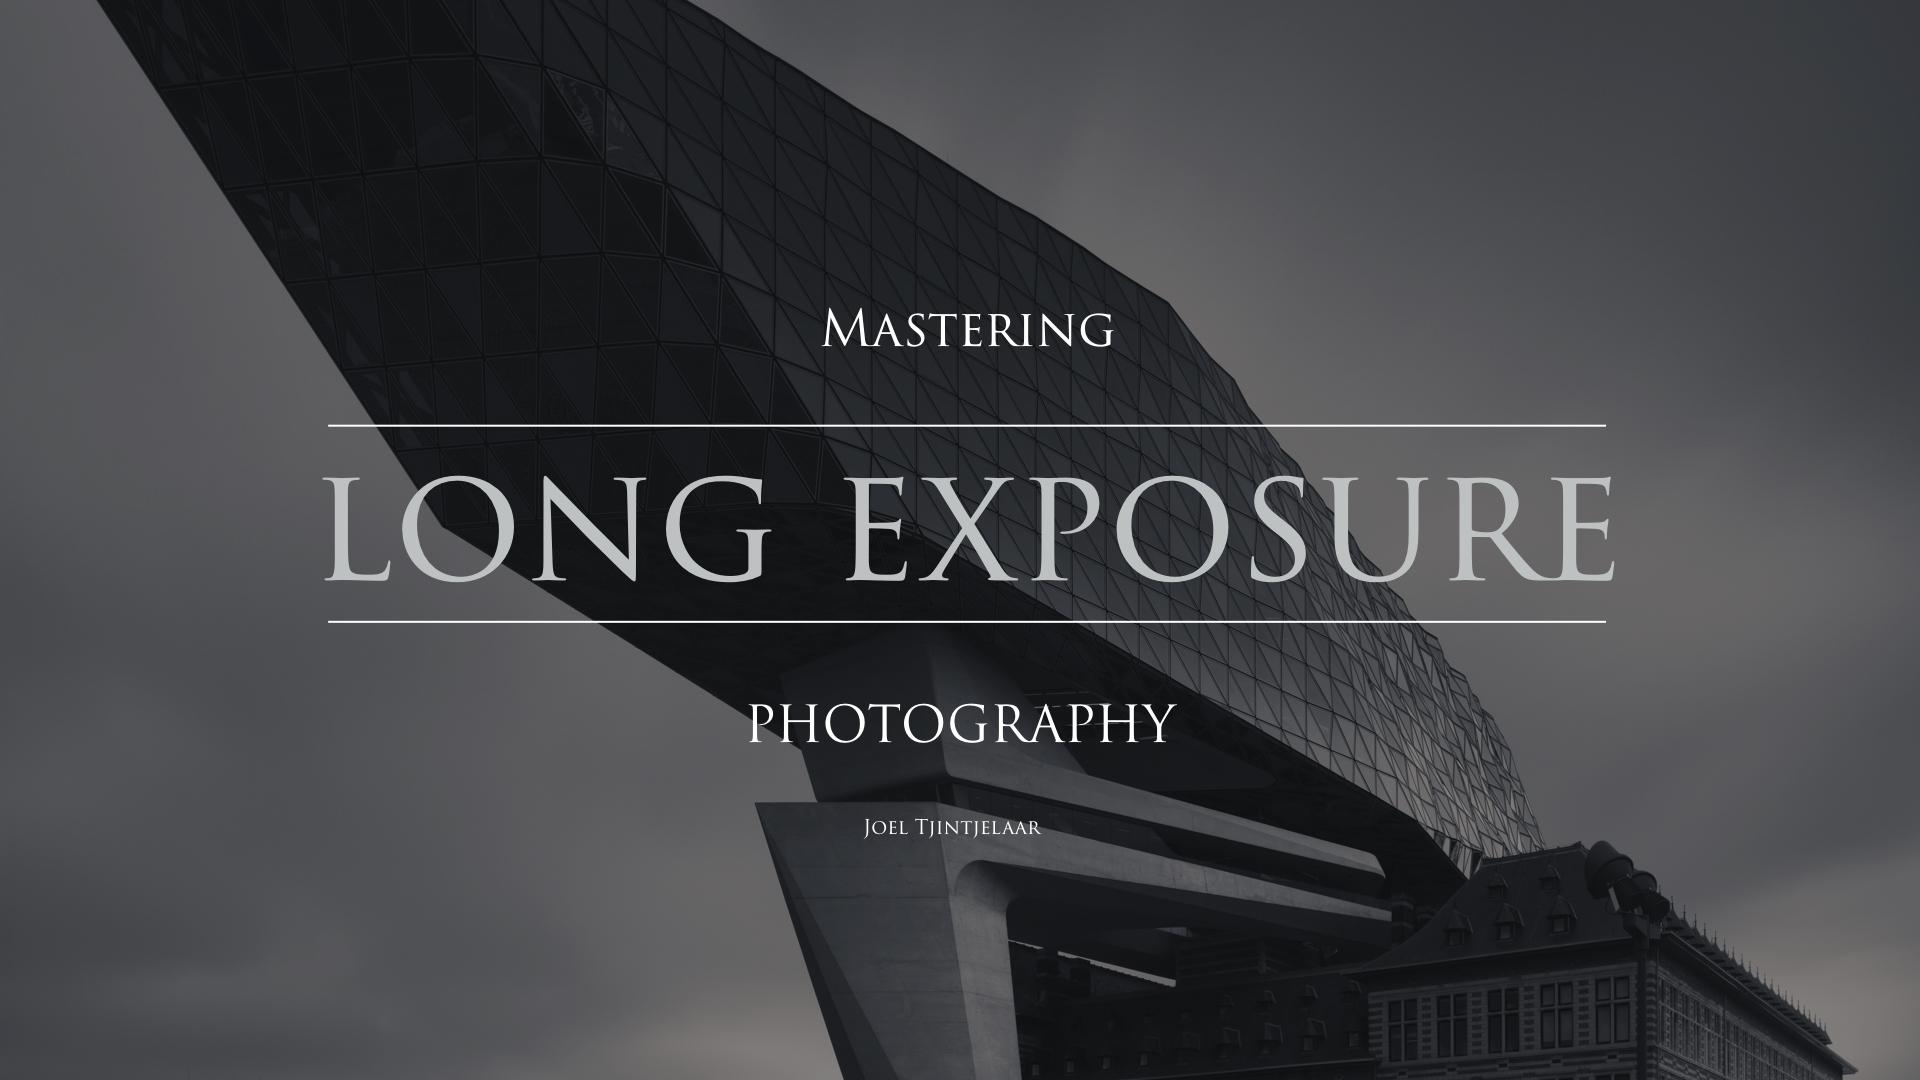 Mastering Long Exposure Photography - title visual.jpg